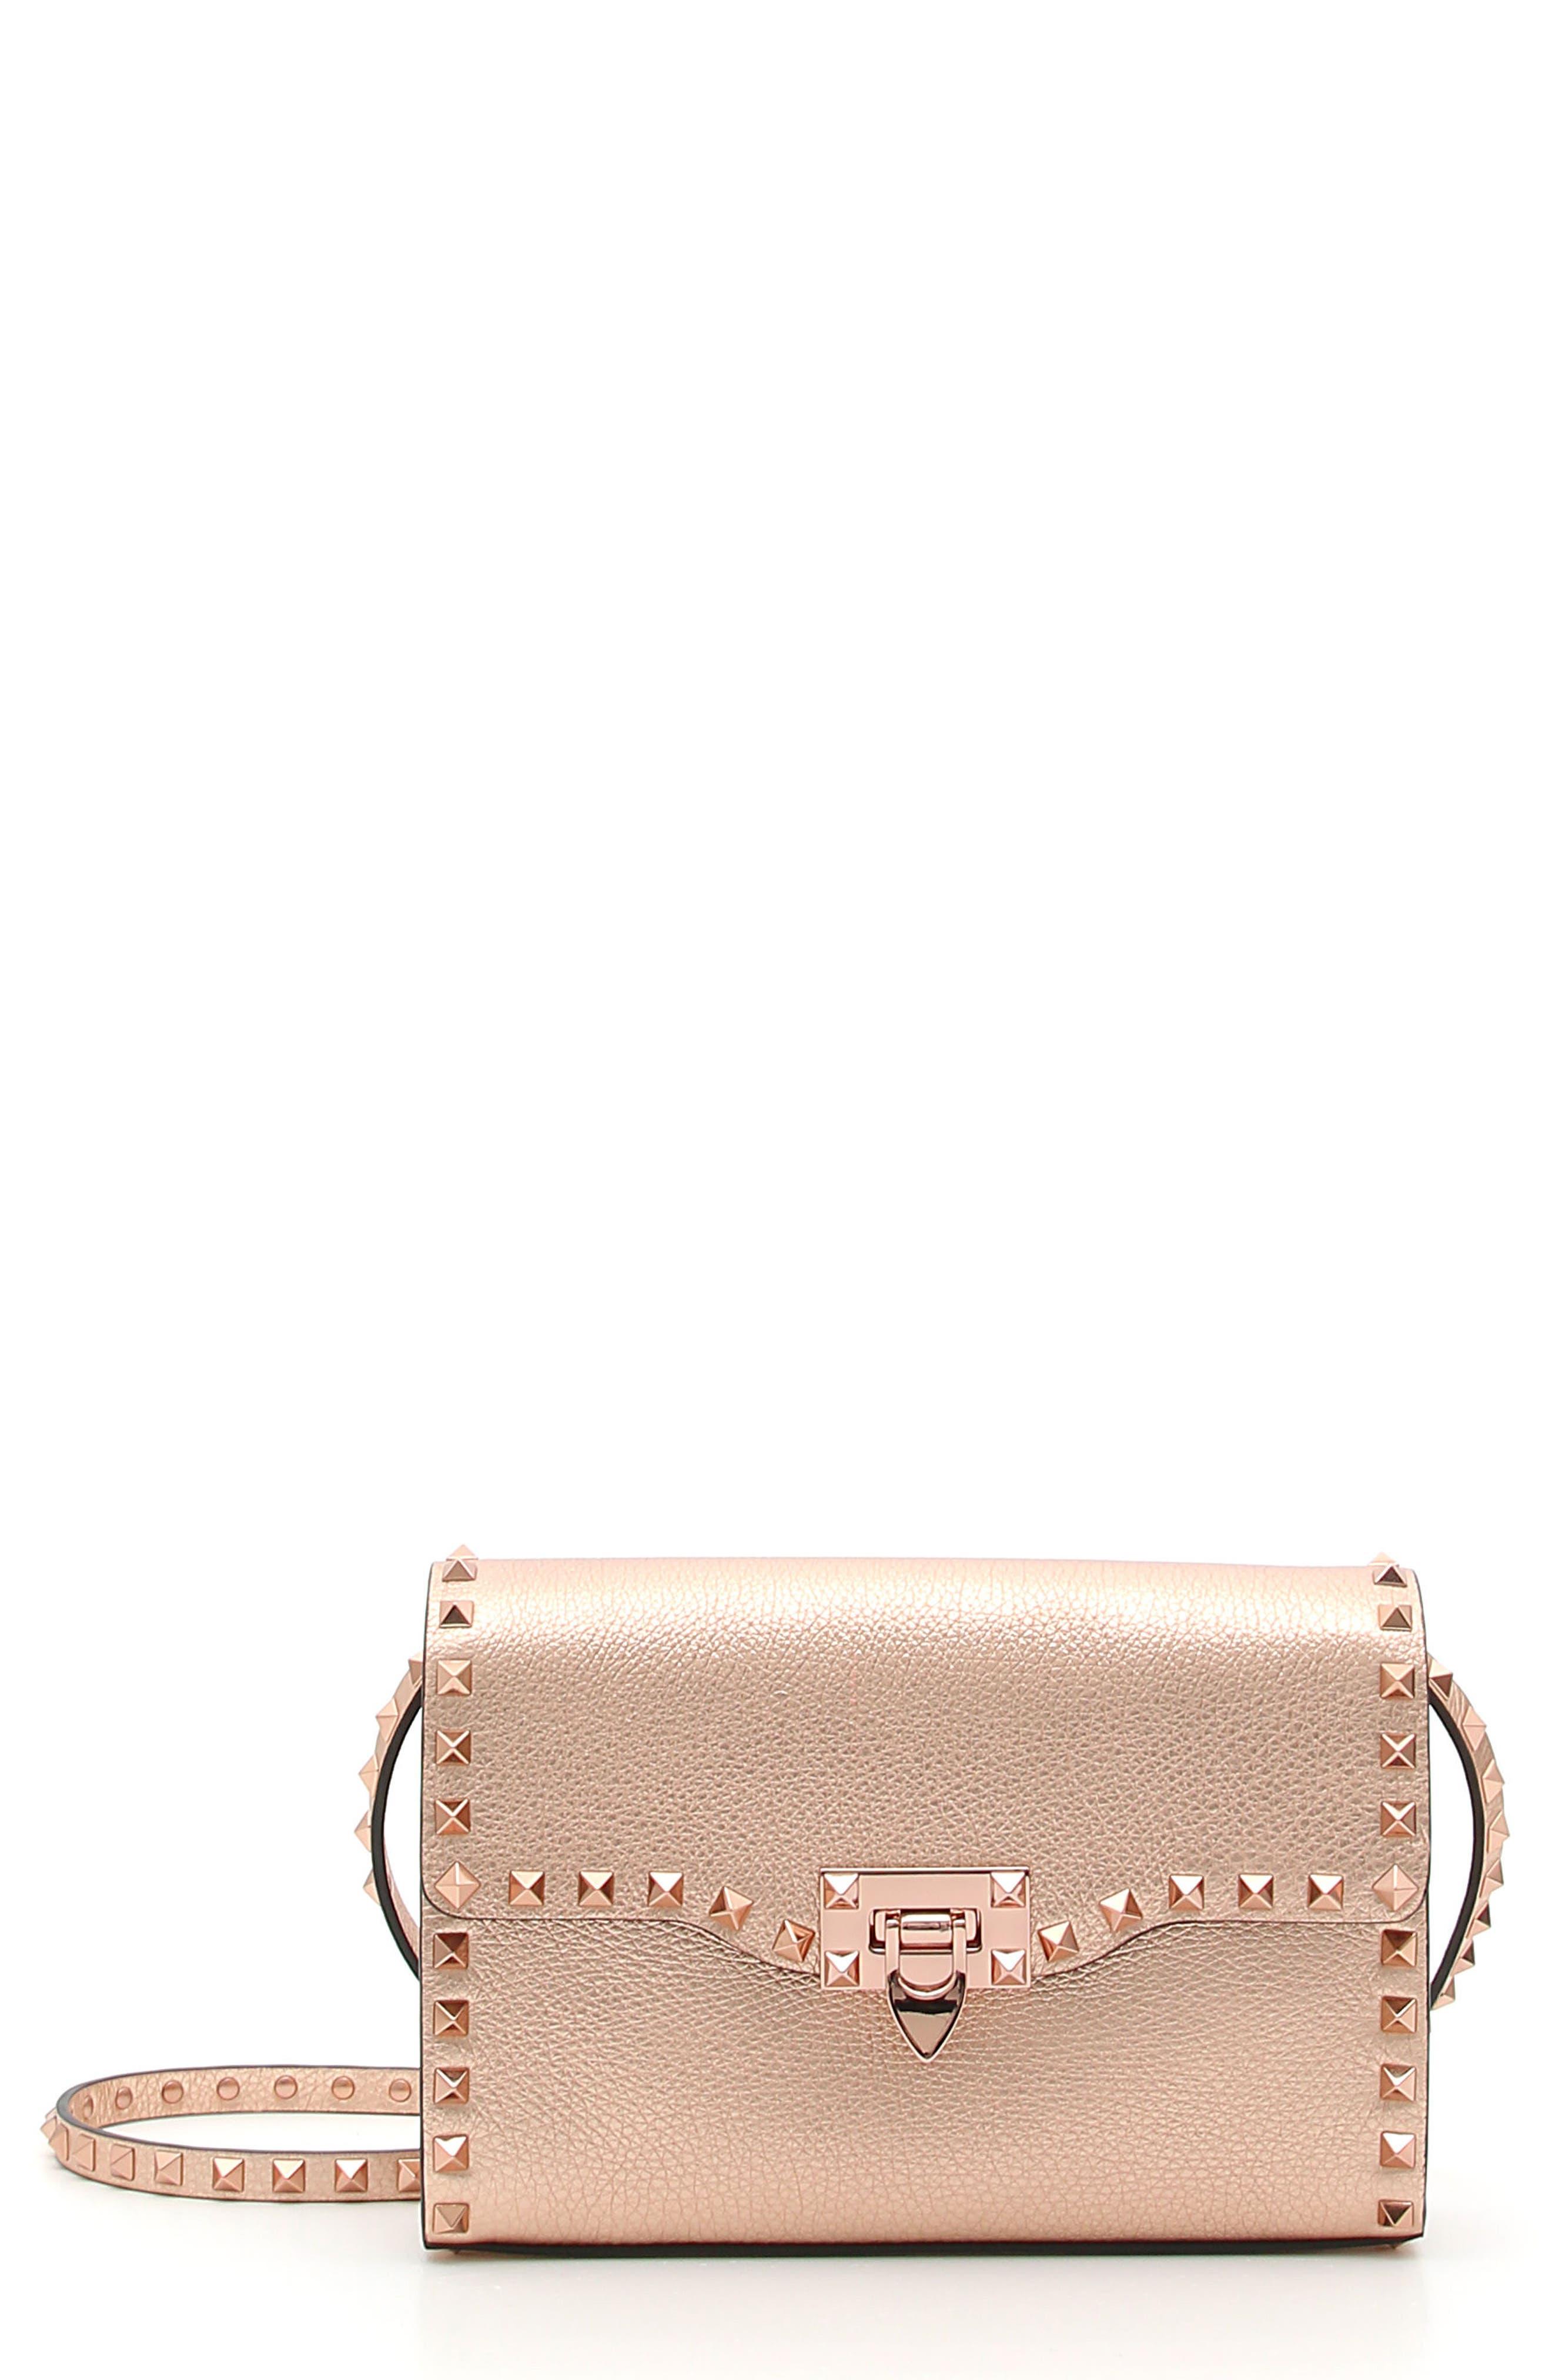 VALENTINO GARAVANI Rockstud Medium Metallic Leather Shoulder Bag